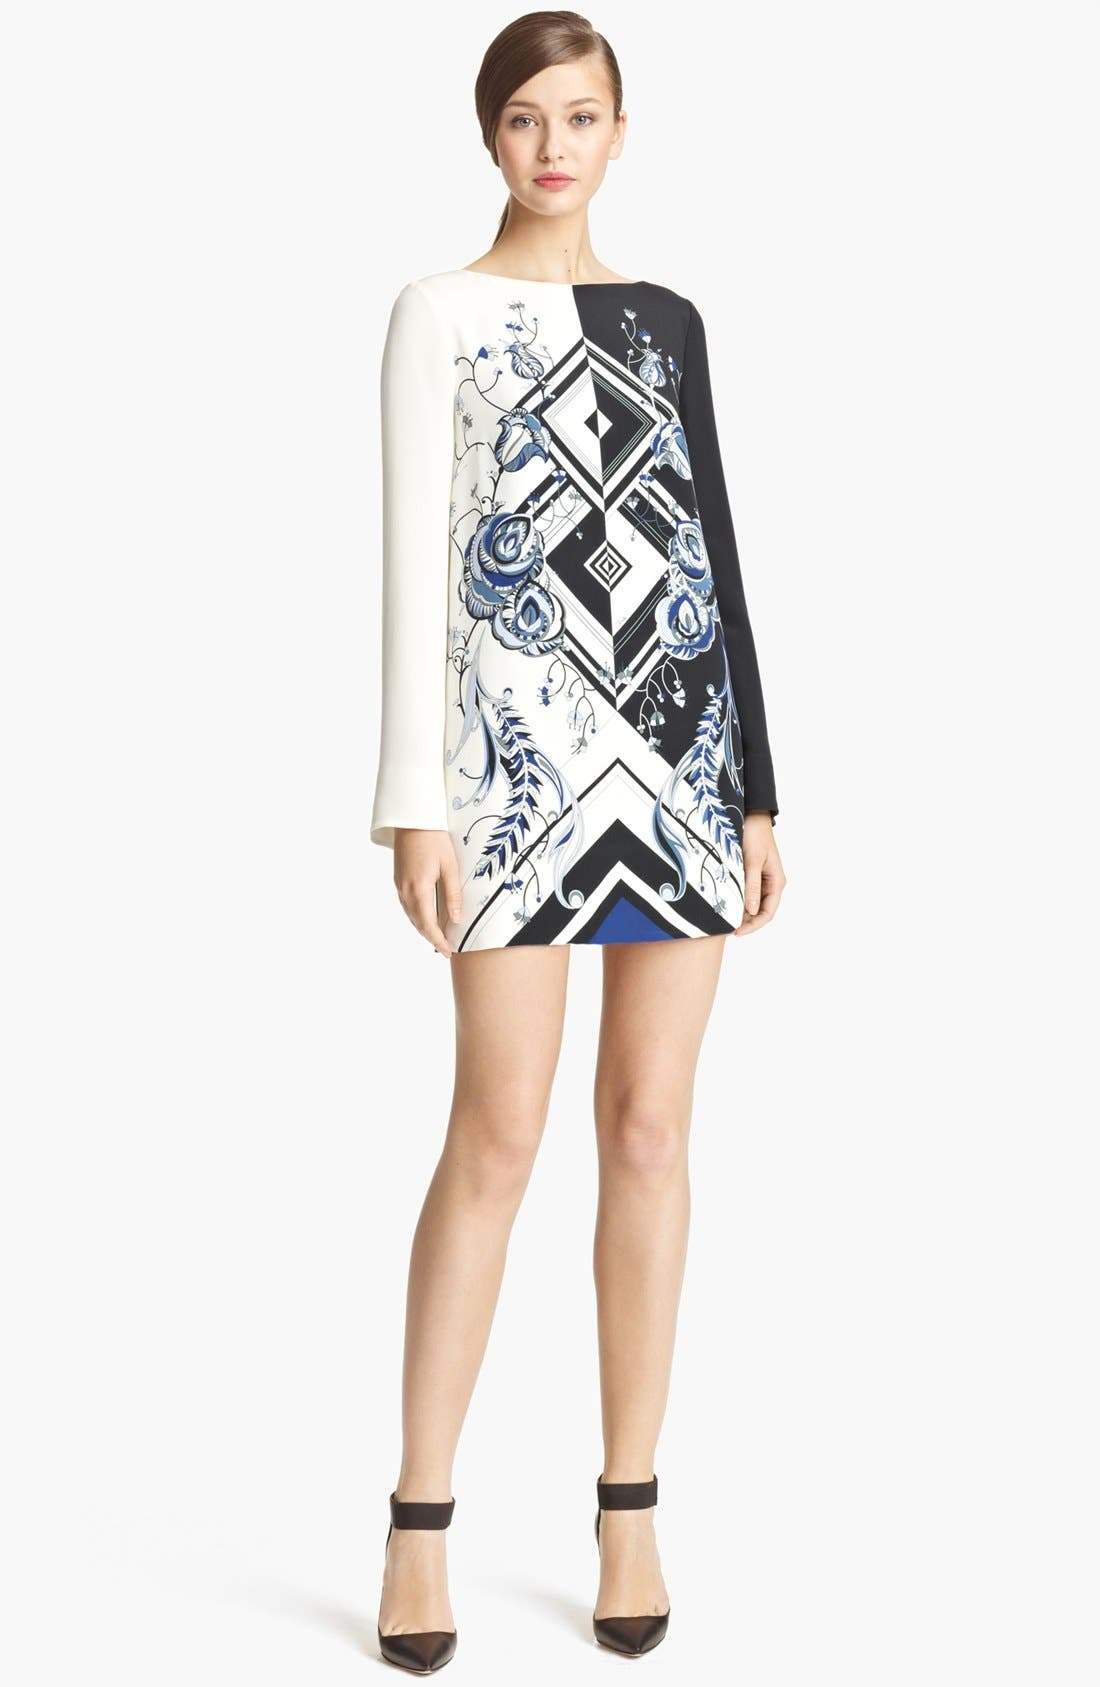 Alternate Image 1 Selected - Emilio Pucci 'Jazz' Print Silk Tunic Dress